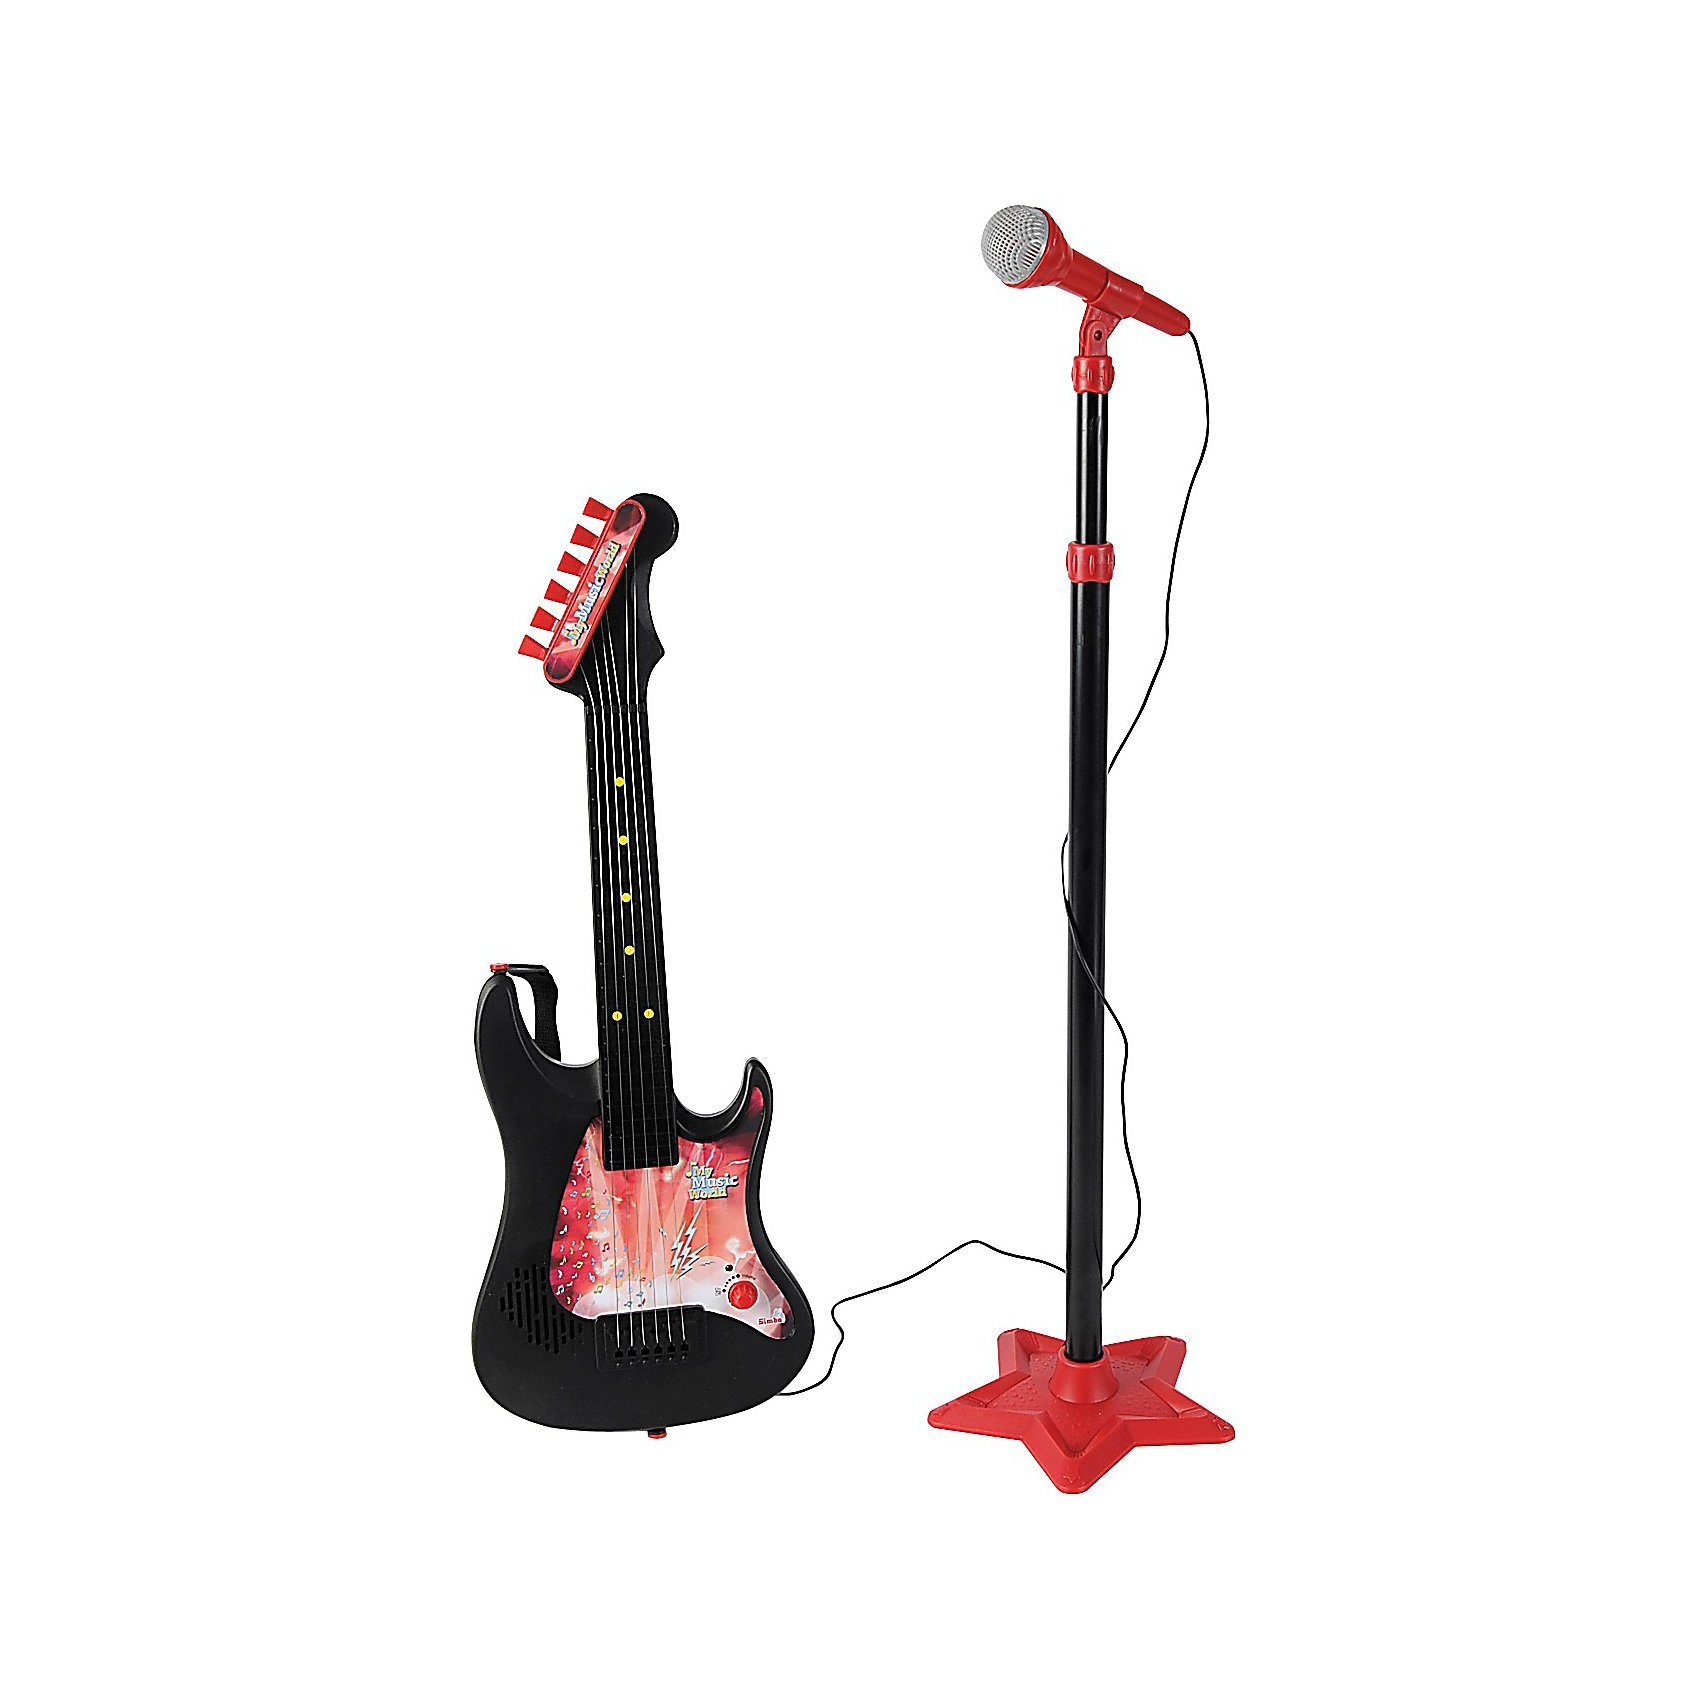 Simba Gitarre mit Standmikrofon